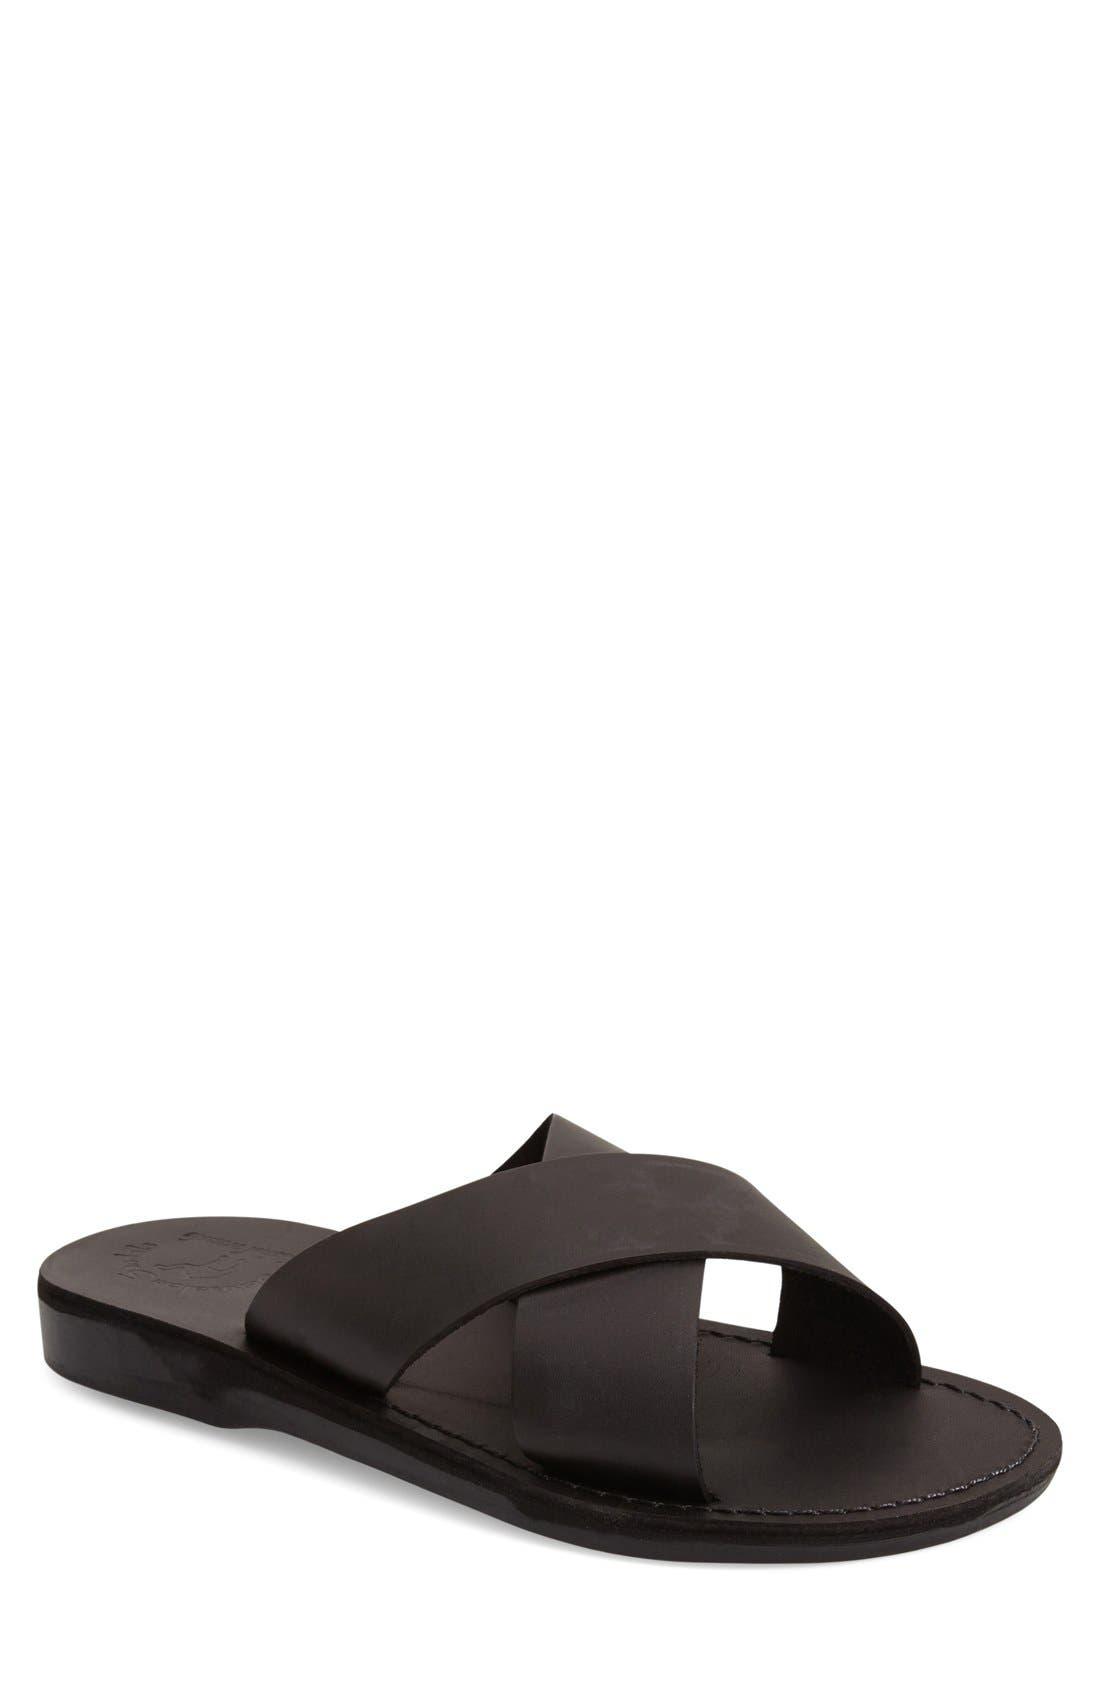 'Elan' Slide Sandal